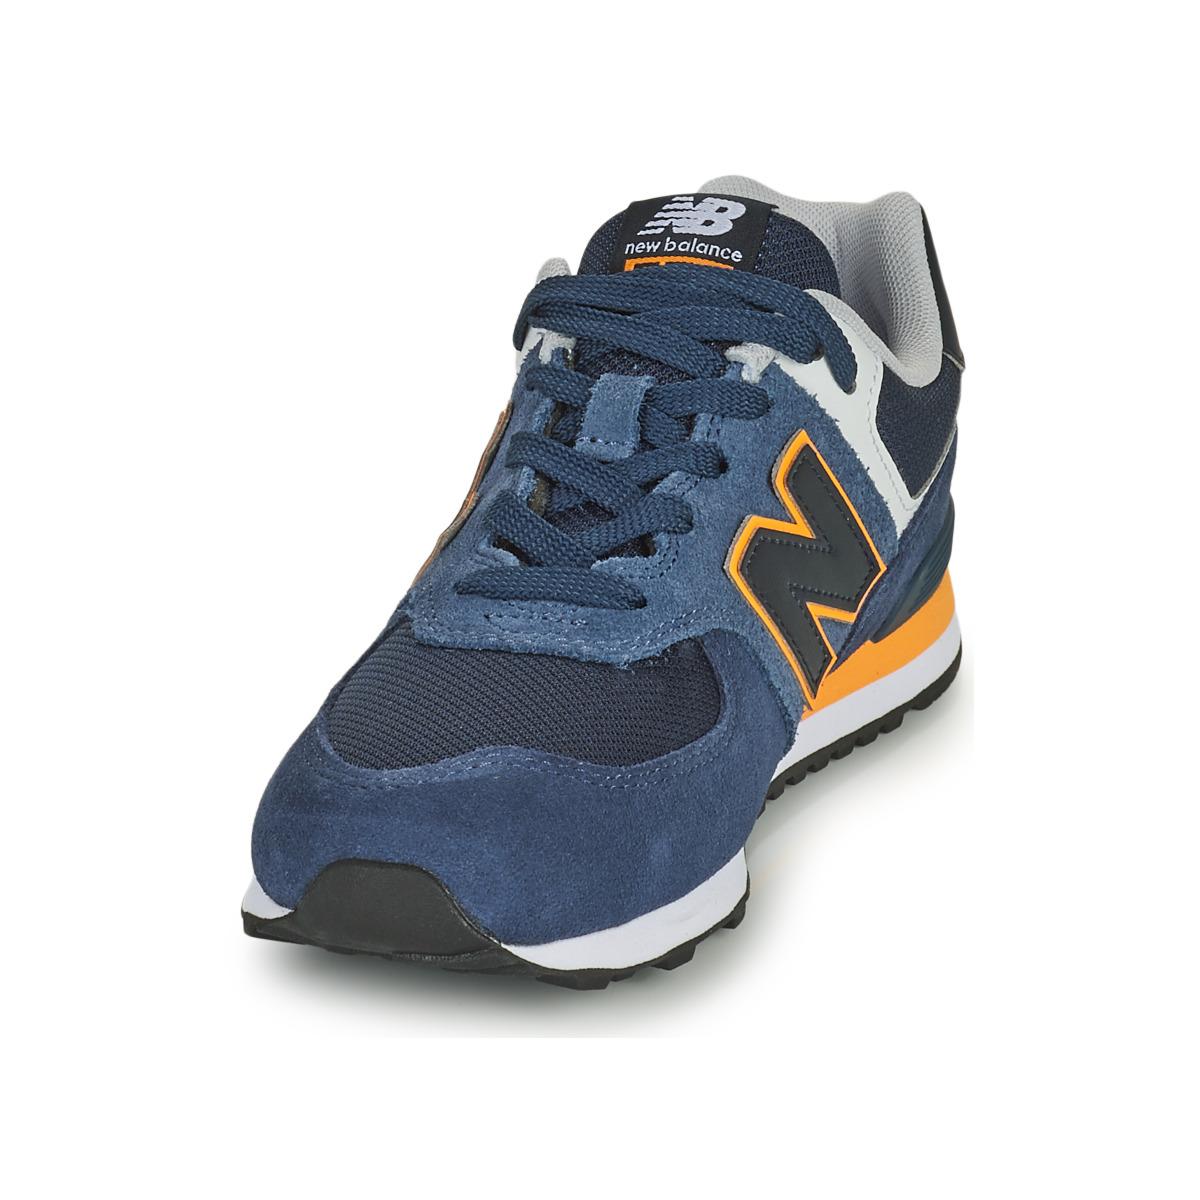 New Balance 574 Blu Bambino 18751308 Consegna Gratuita